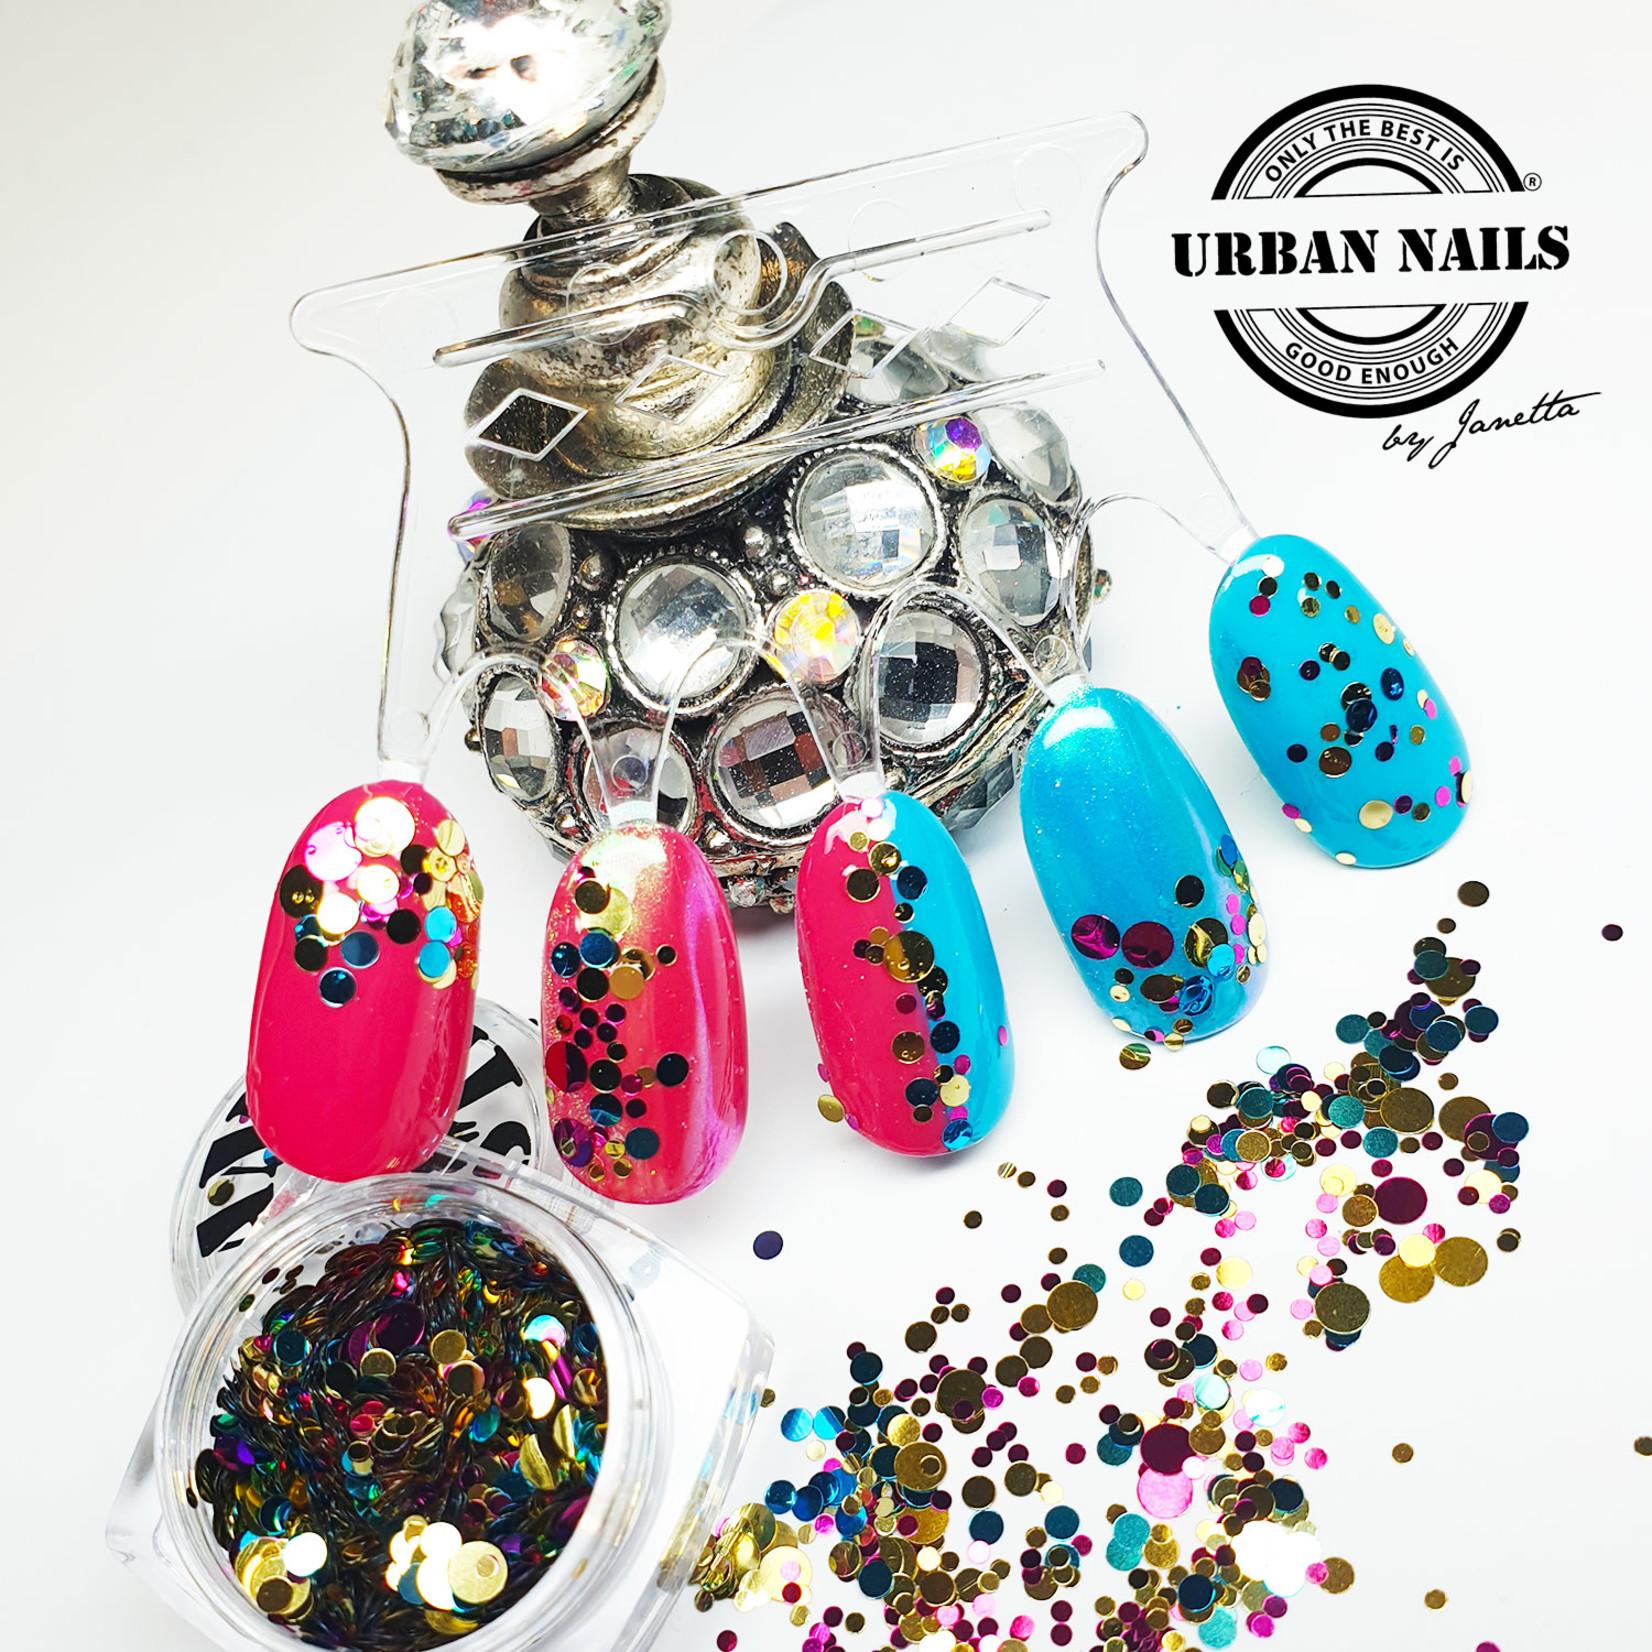 Urban Nails Pareltje van de Week 18